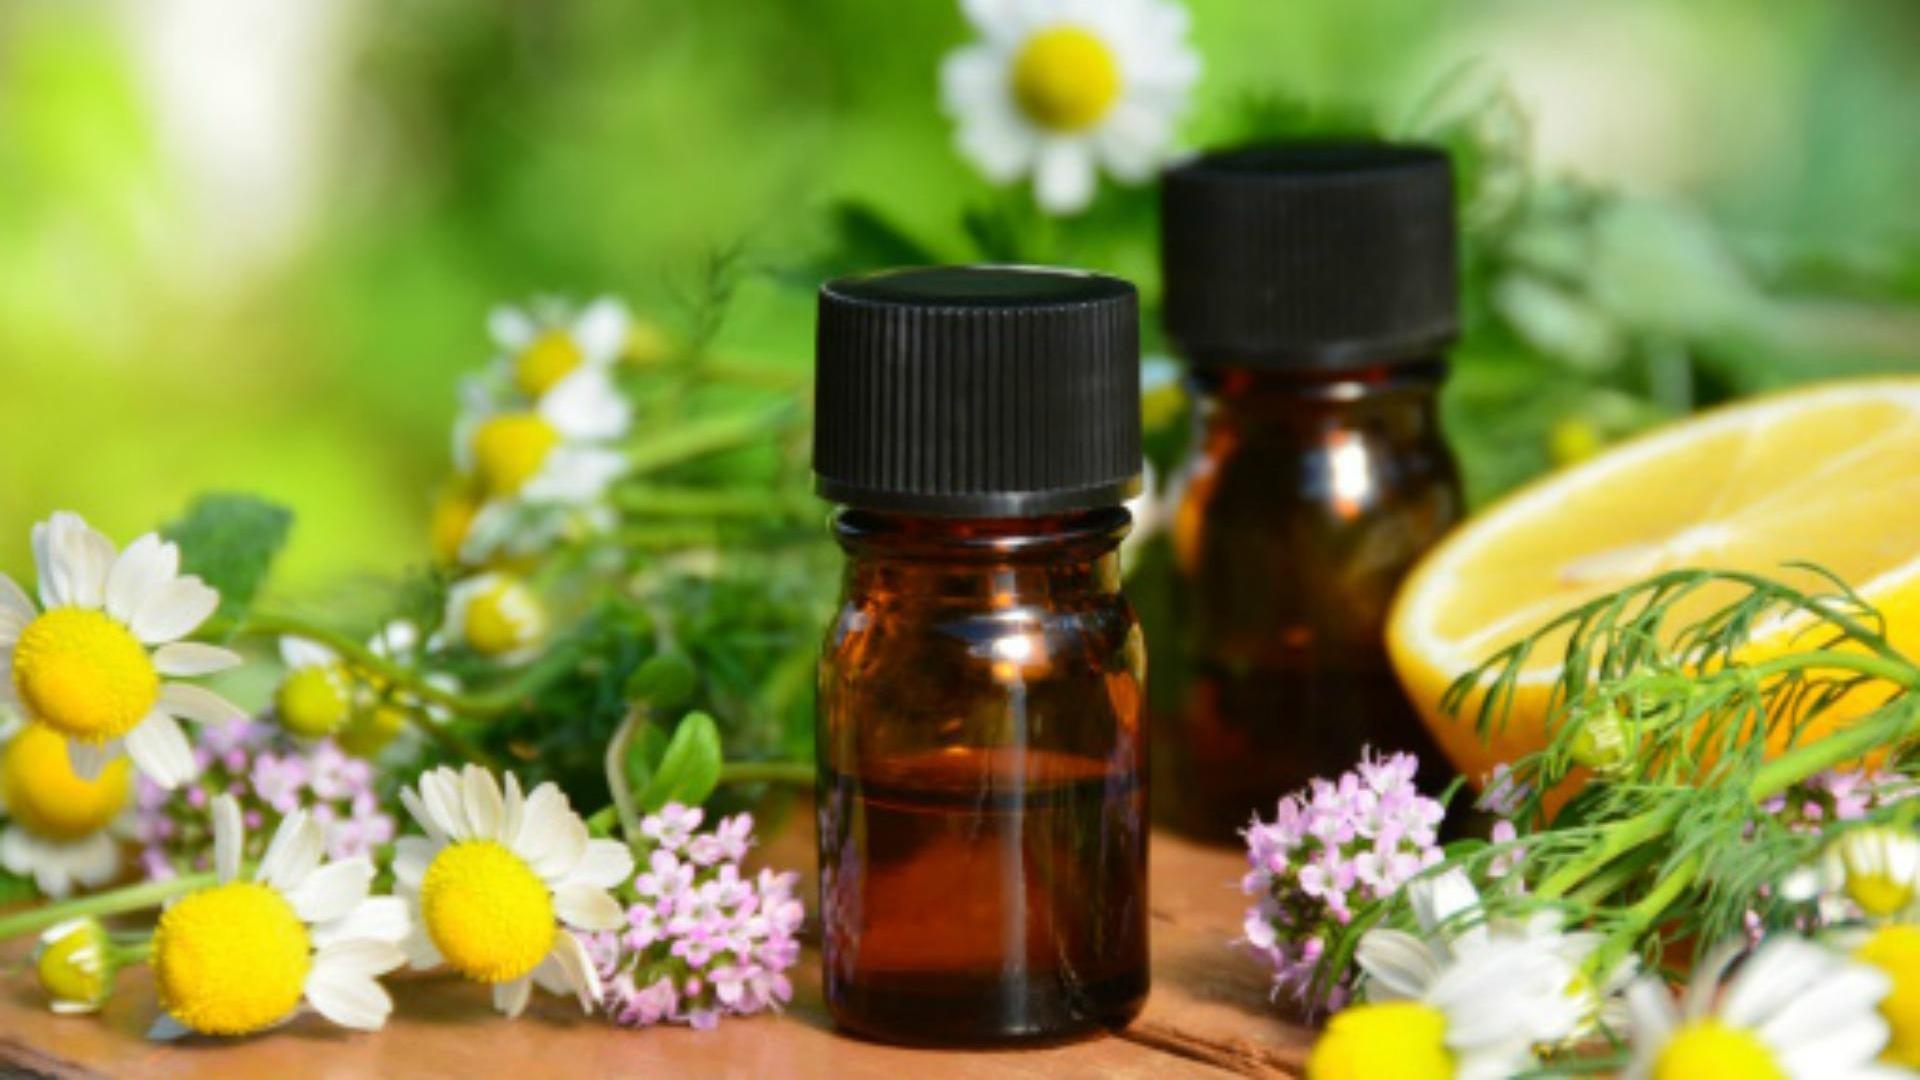 Image result for homemade oils,nari